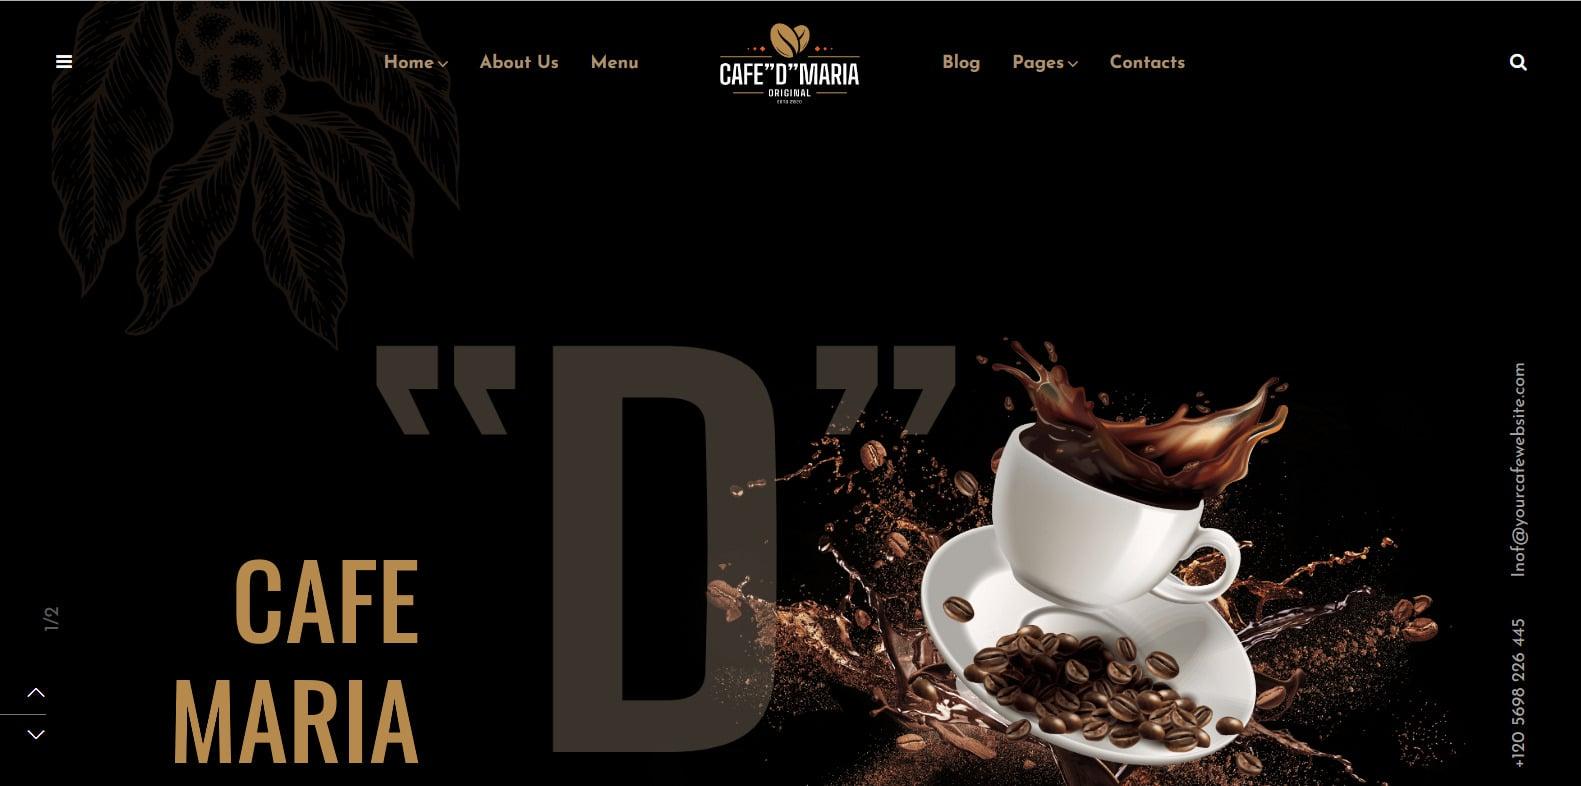 cafe-de-maria-coffee-shop-website-template